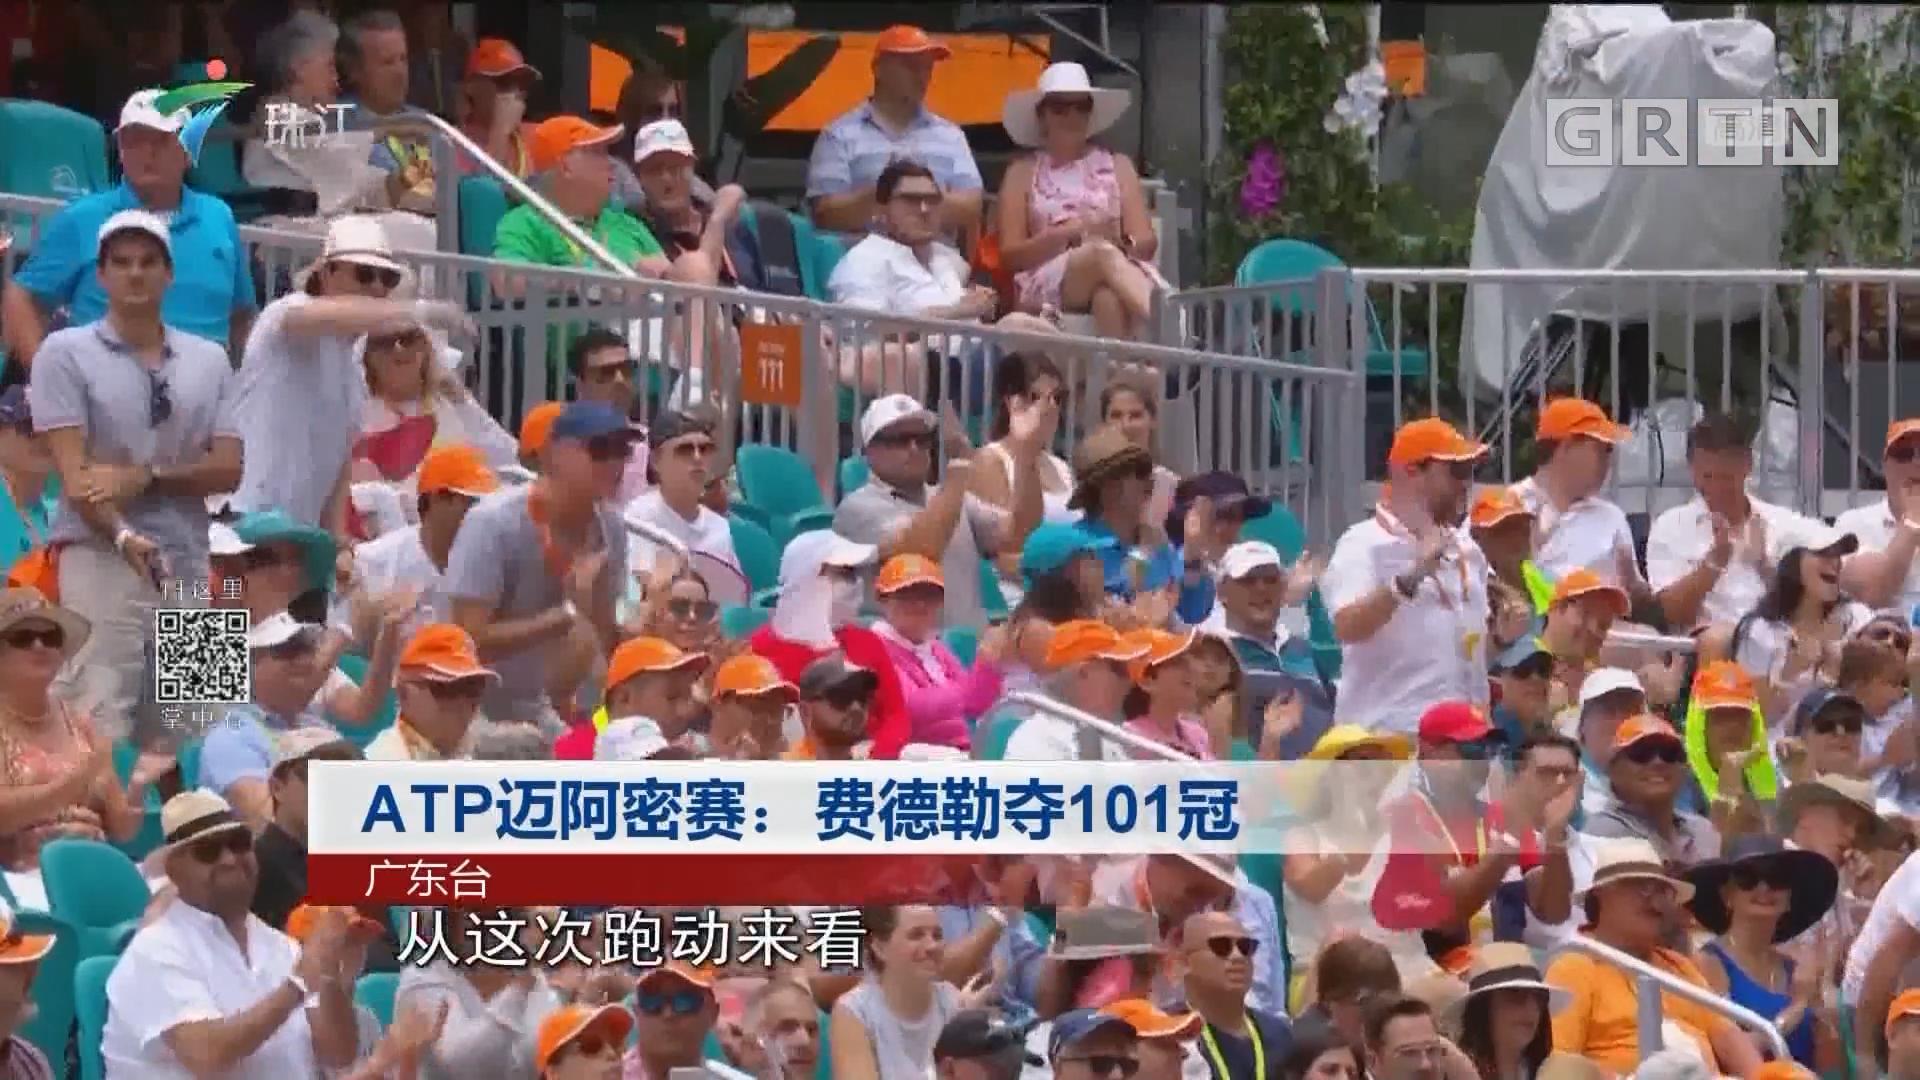 ATP迈阿密赛:费德勒夺101冠